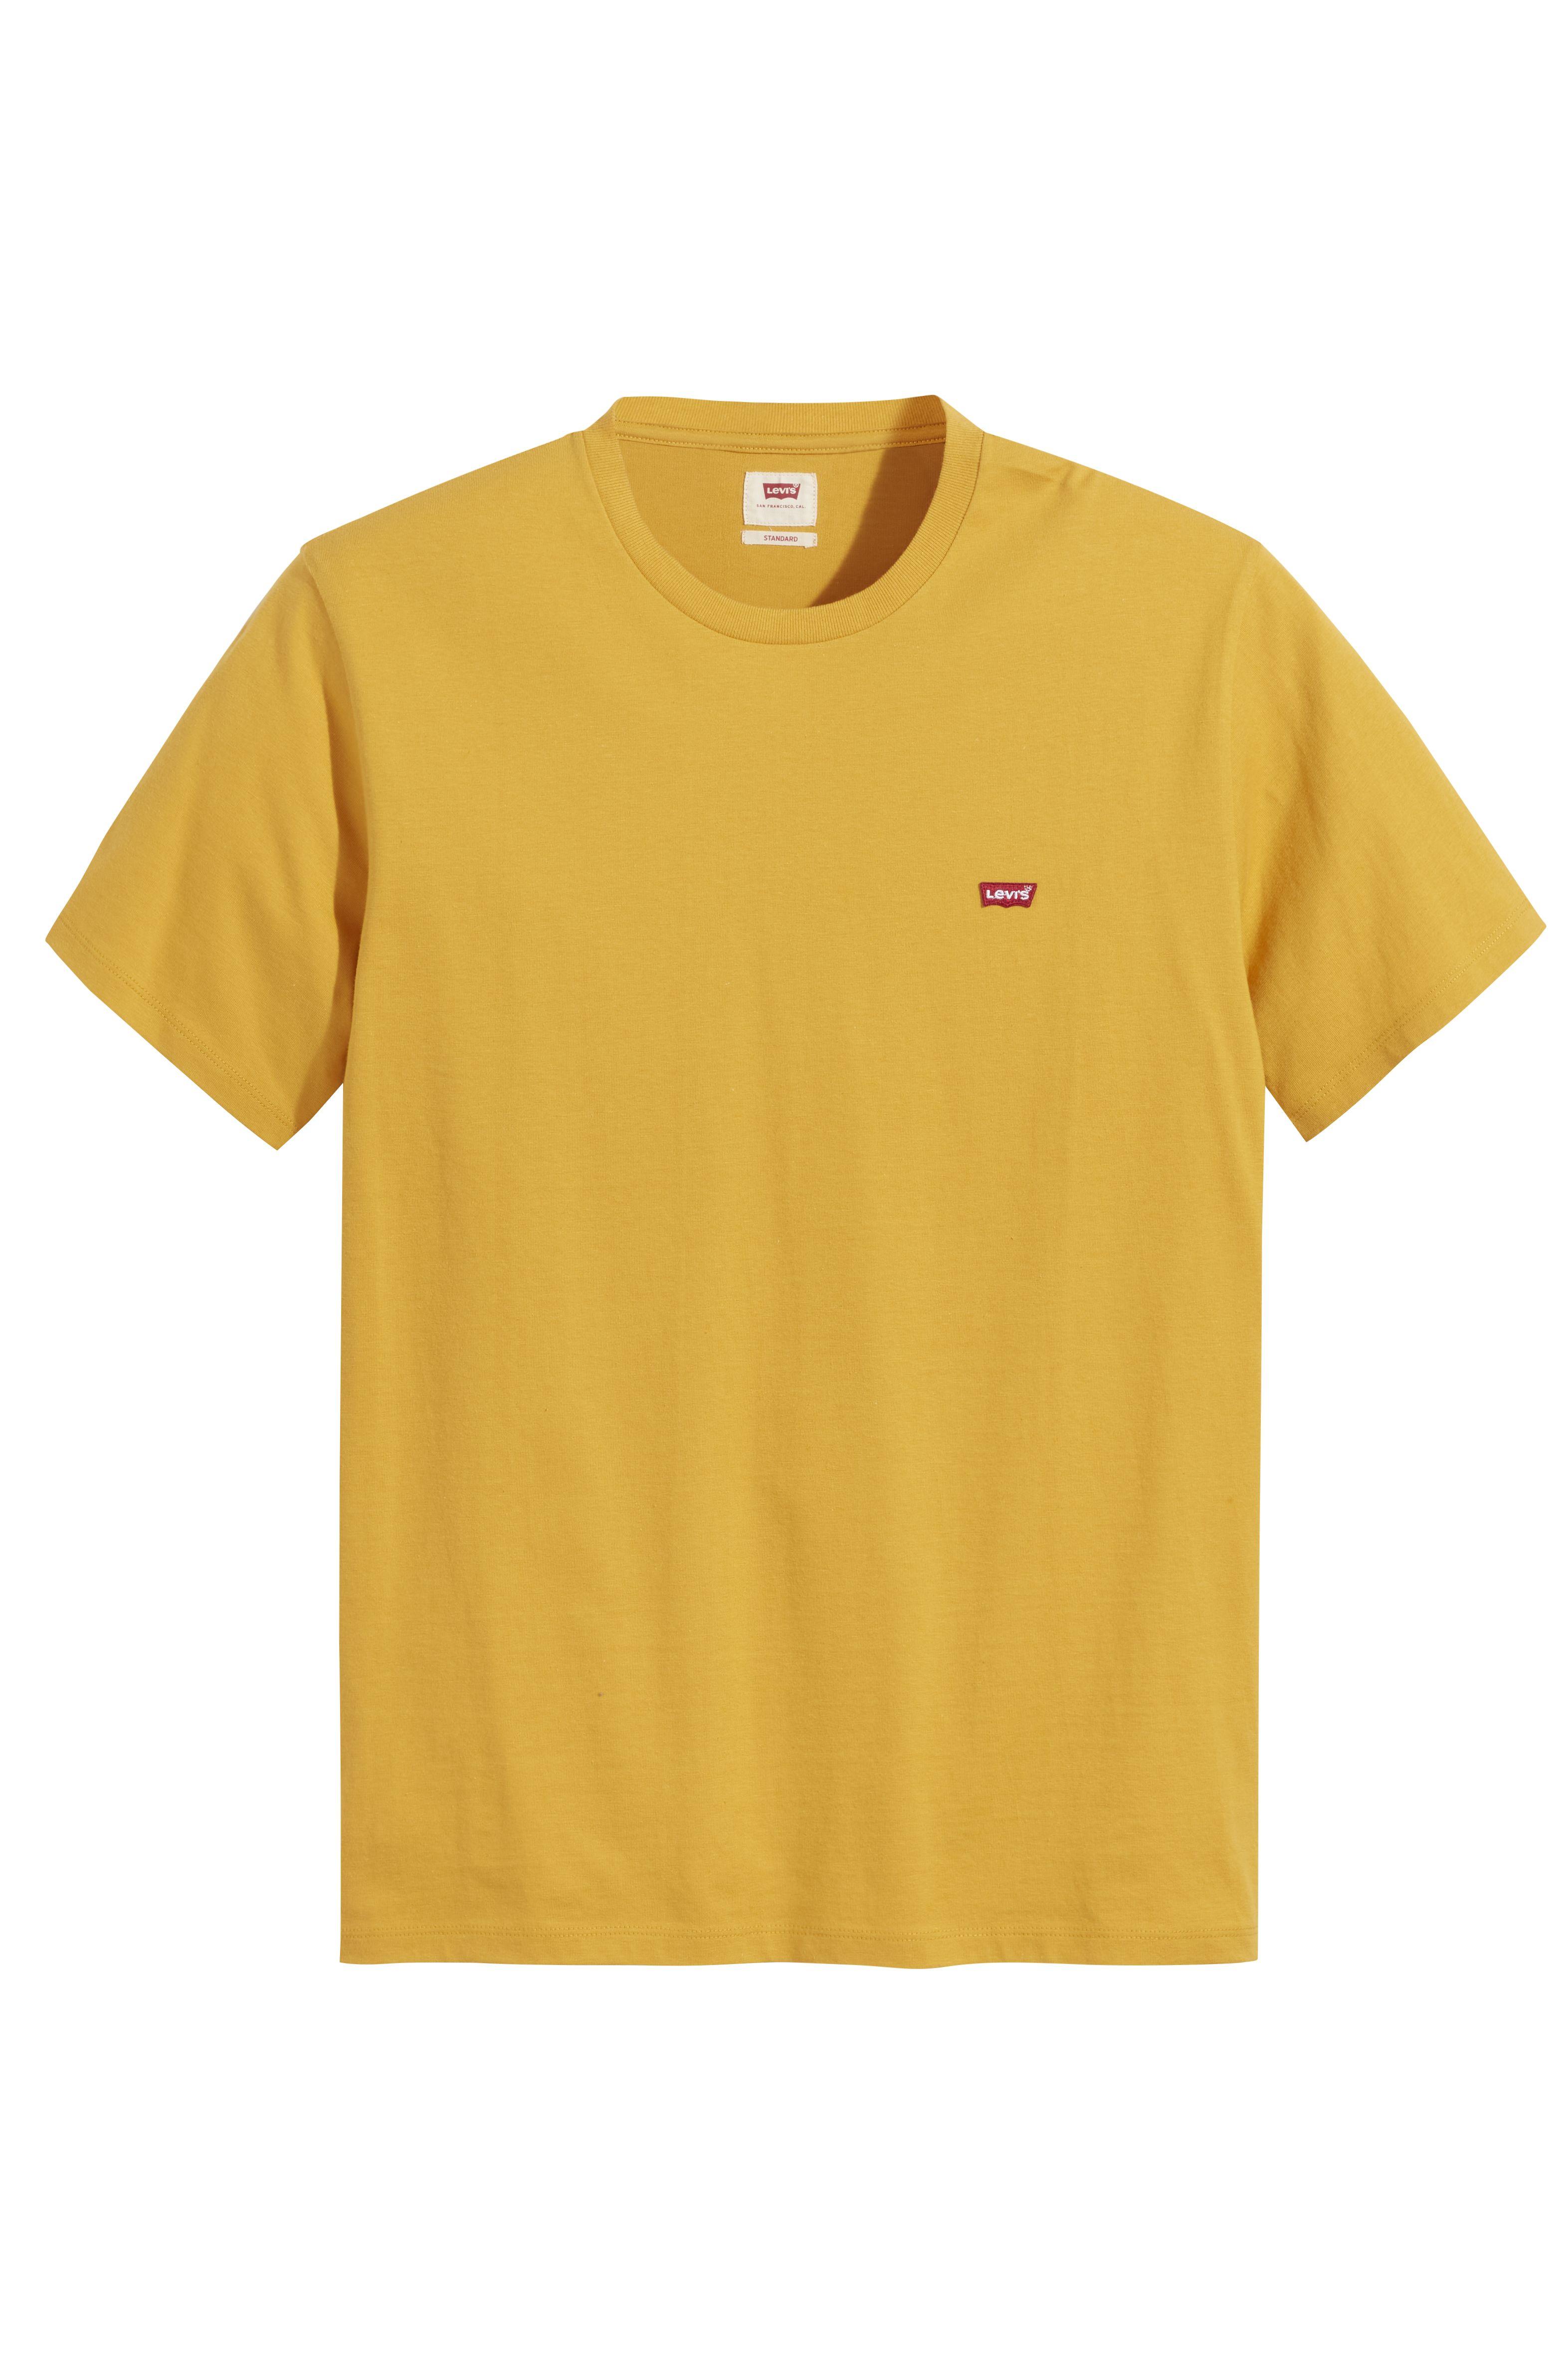 T-Shirt Levis ORIGINAL HM Cool Yellow